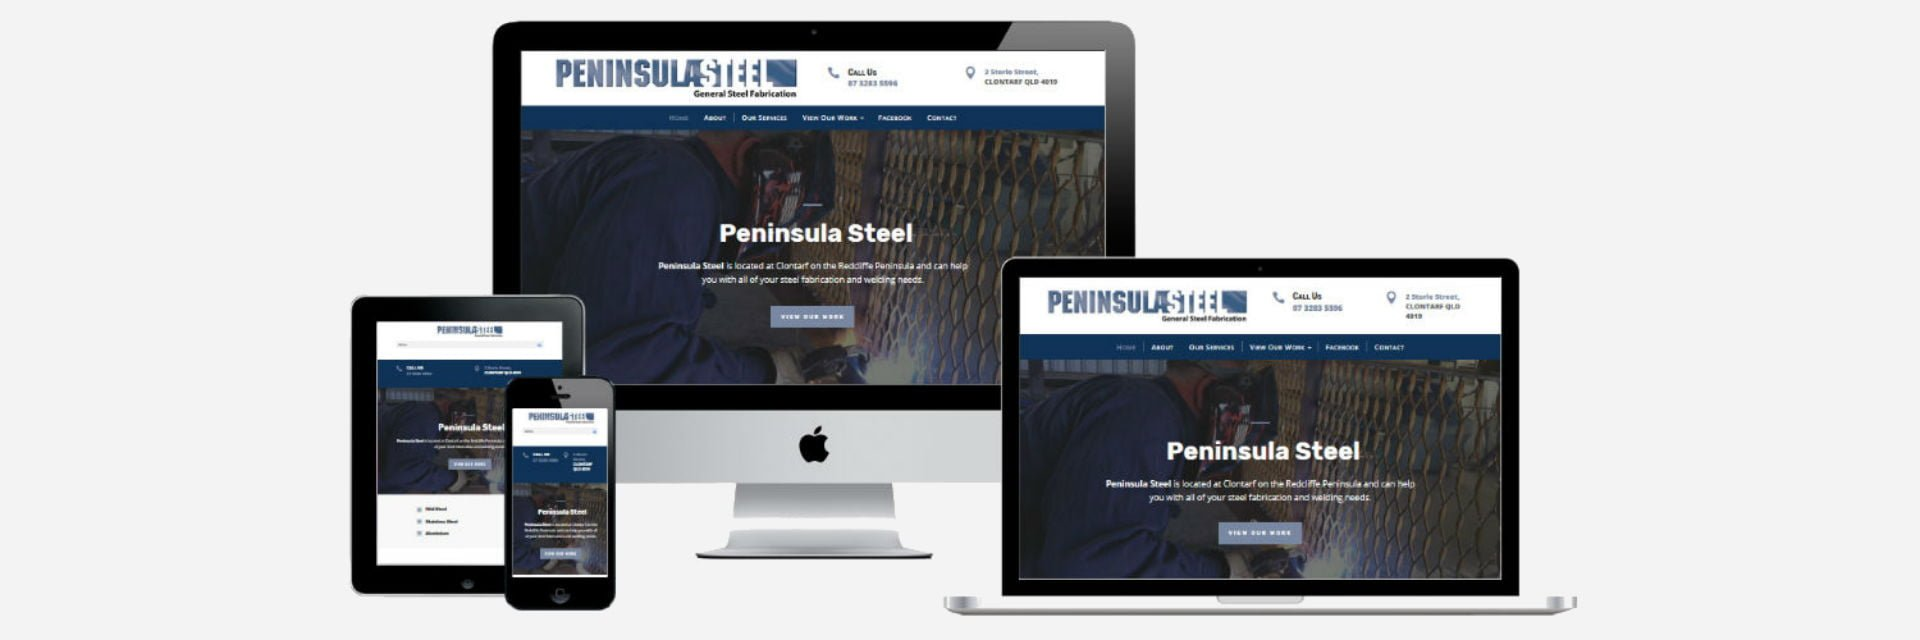 Peninsula Steel Fabrication - New Website Design